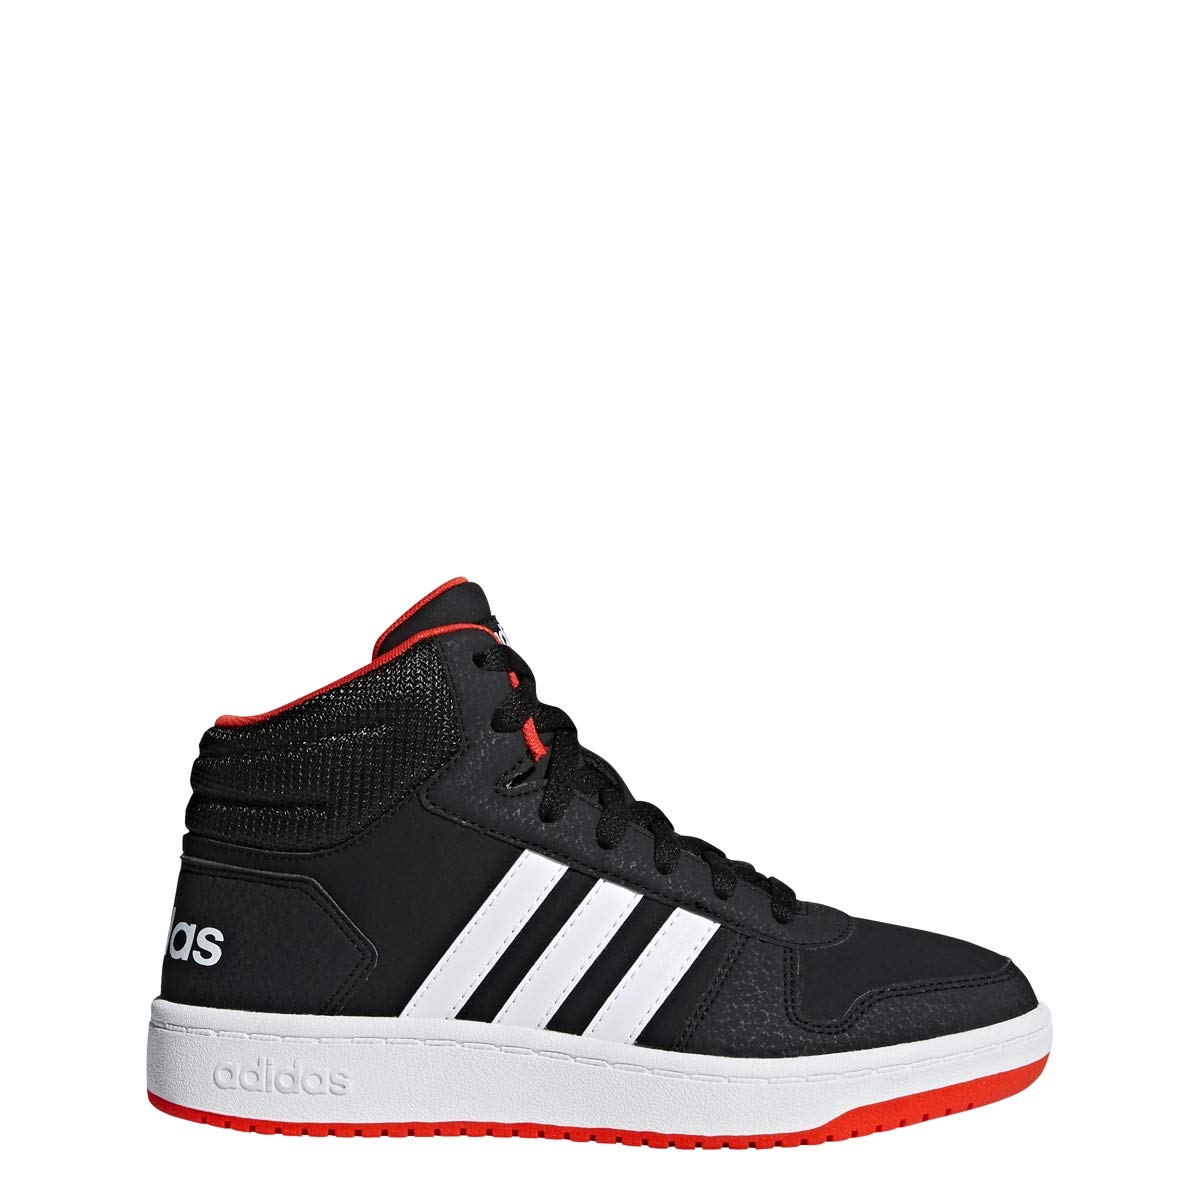 adidas Unisex Hoops 2.0 Basketball Shoe, Black/White/red, 7 M US Big Kid